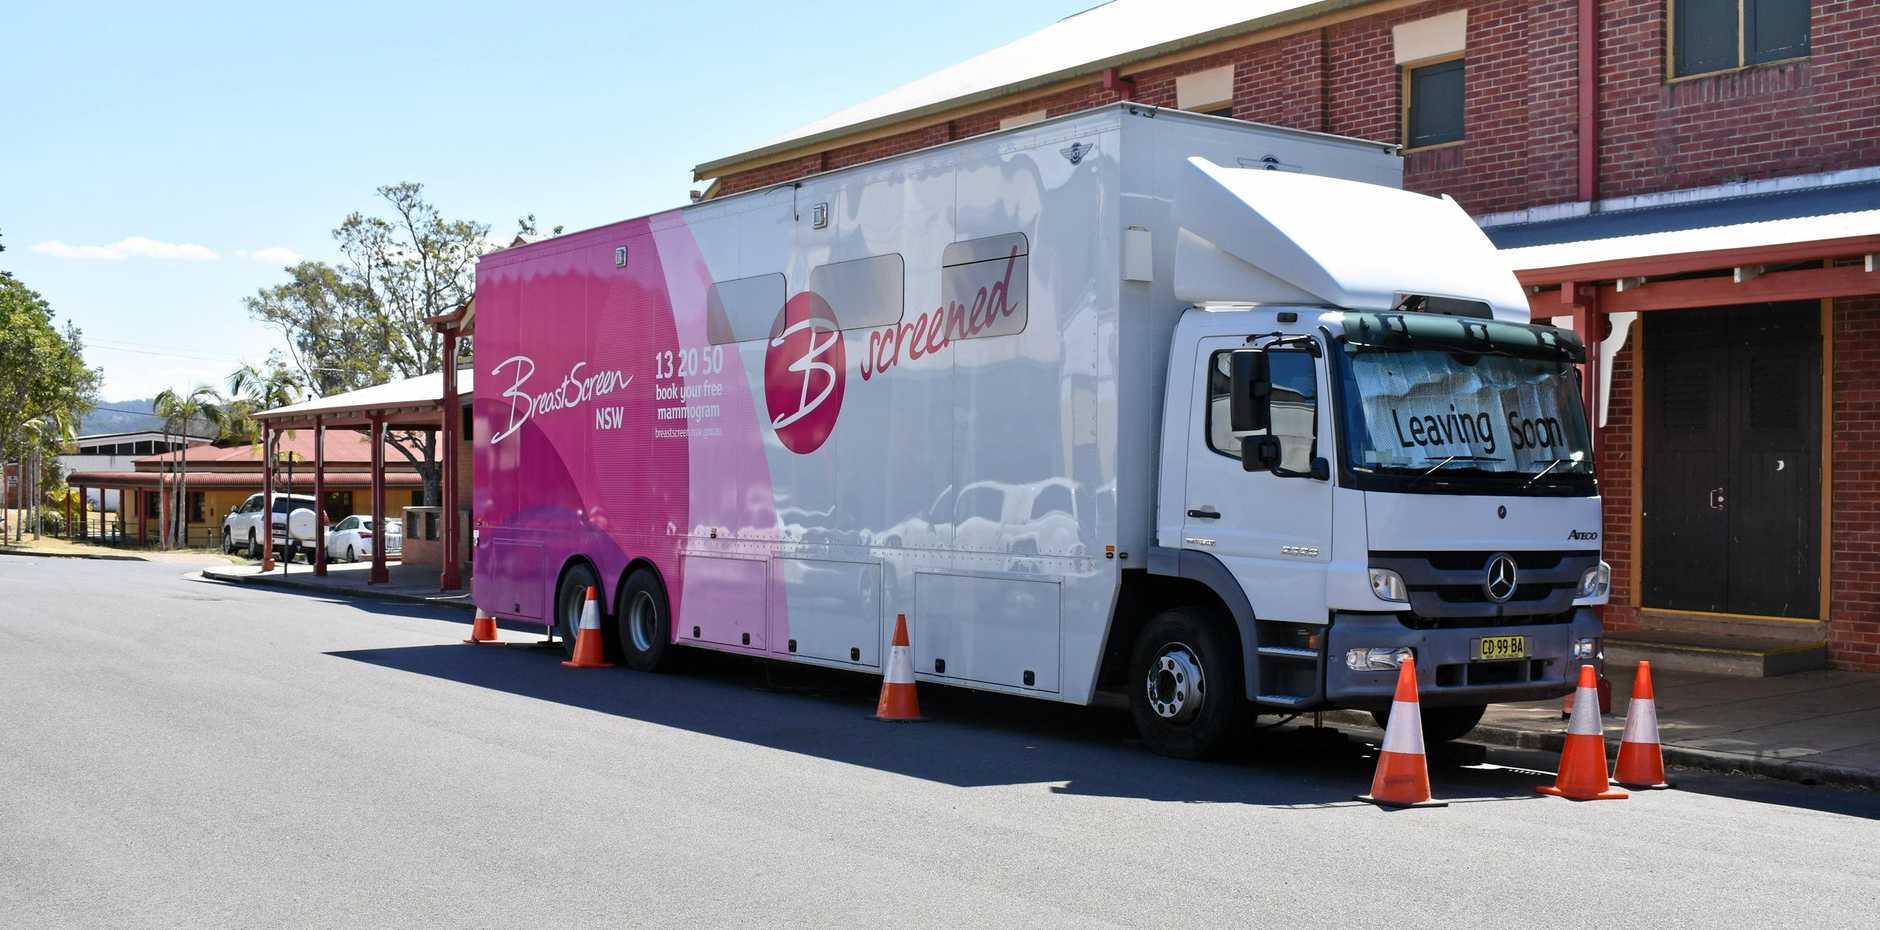 BreastScreen pink bus in Kyogle.